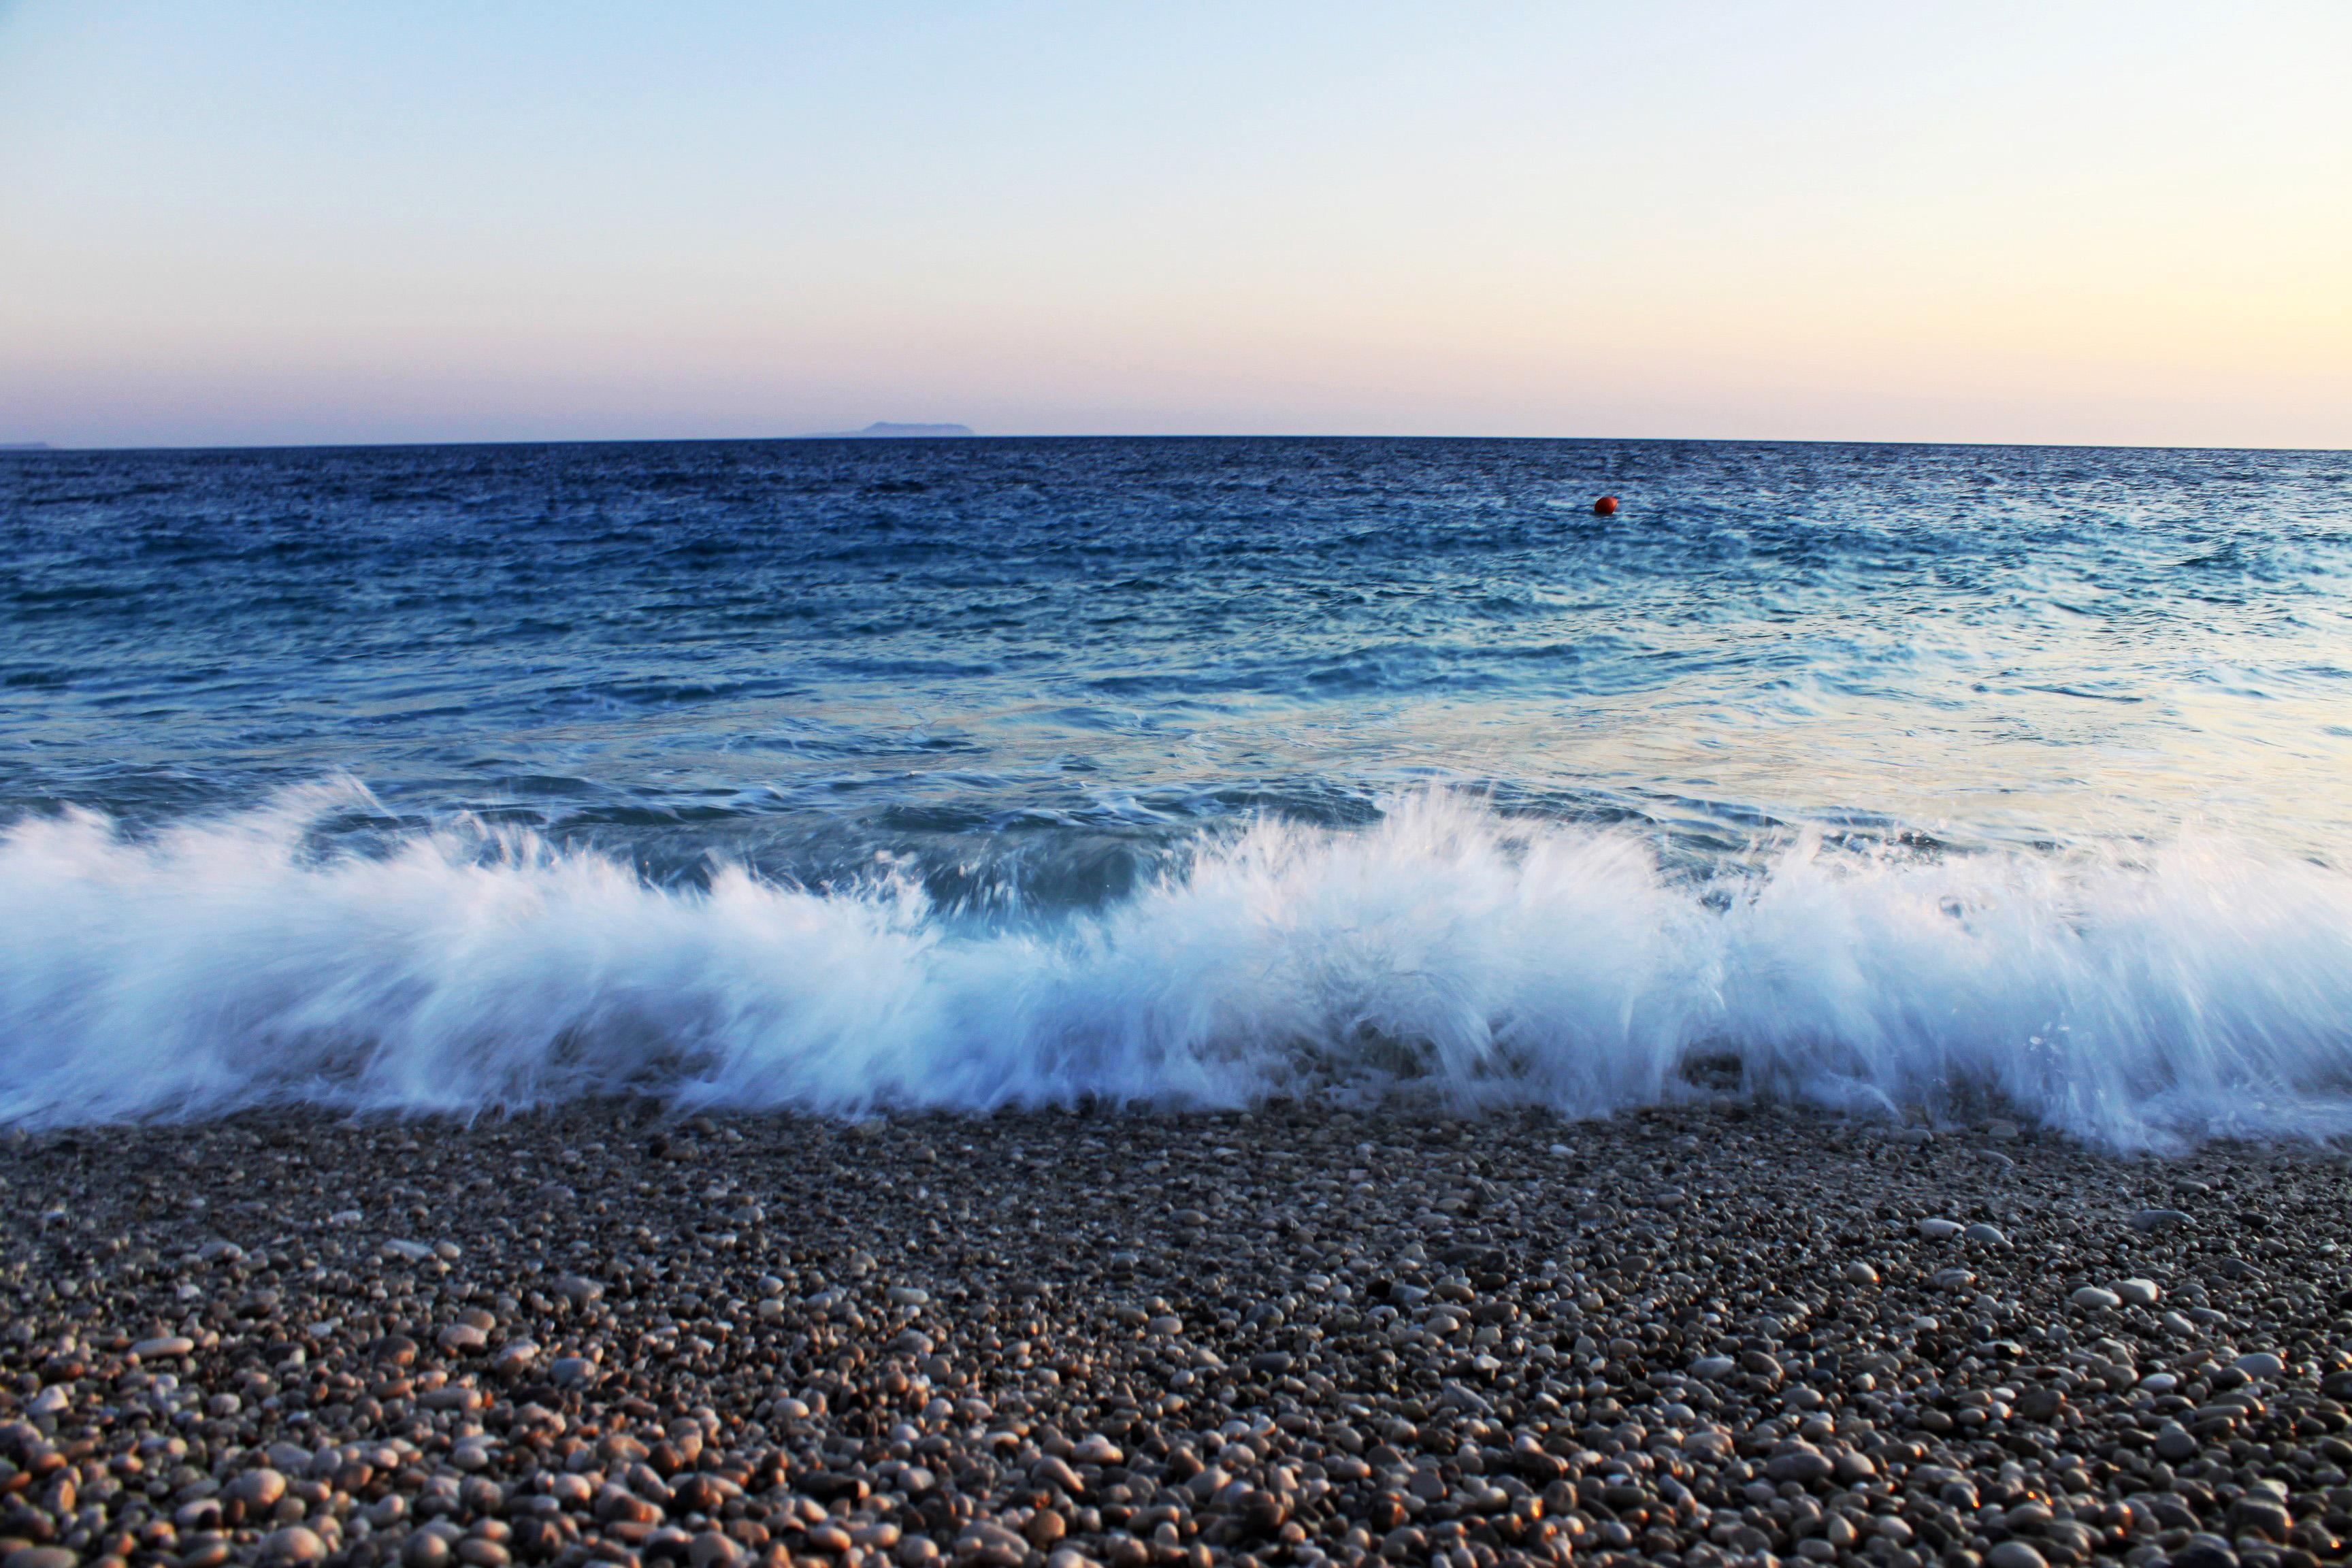 Waves crashing over pebbles on beach image - Free stock photo